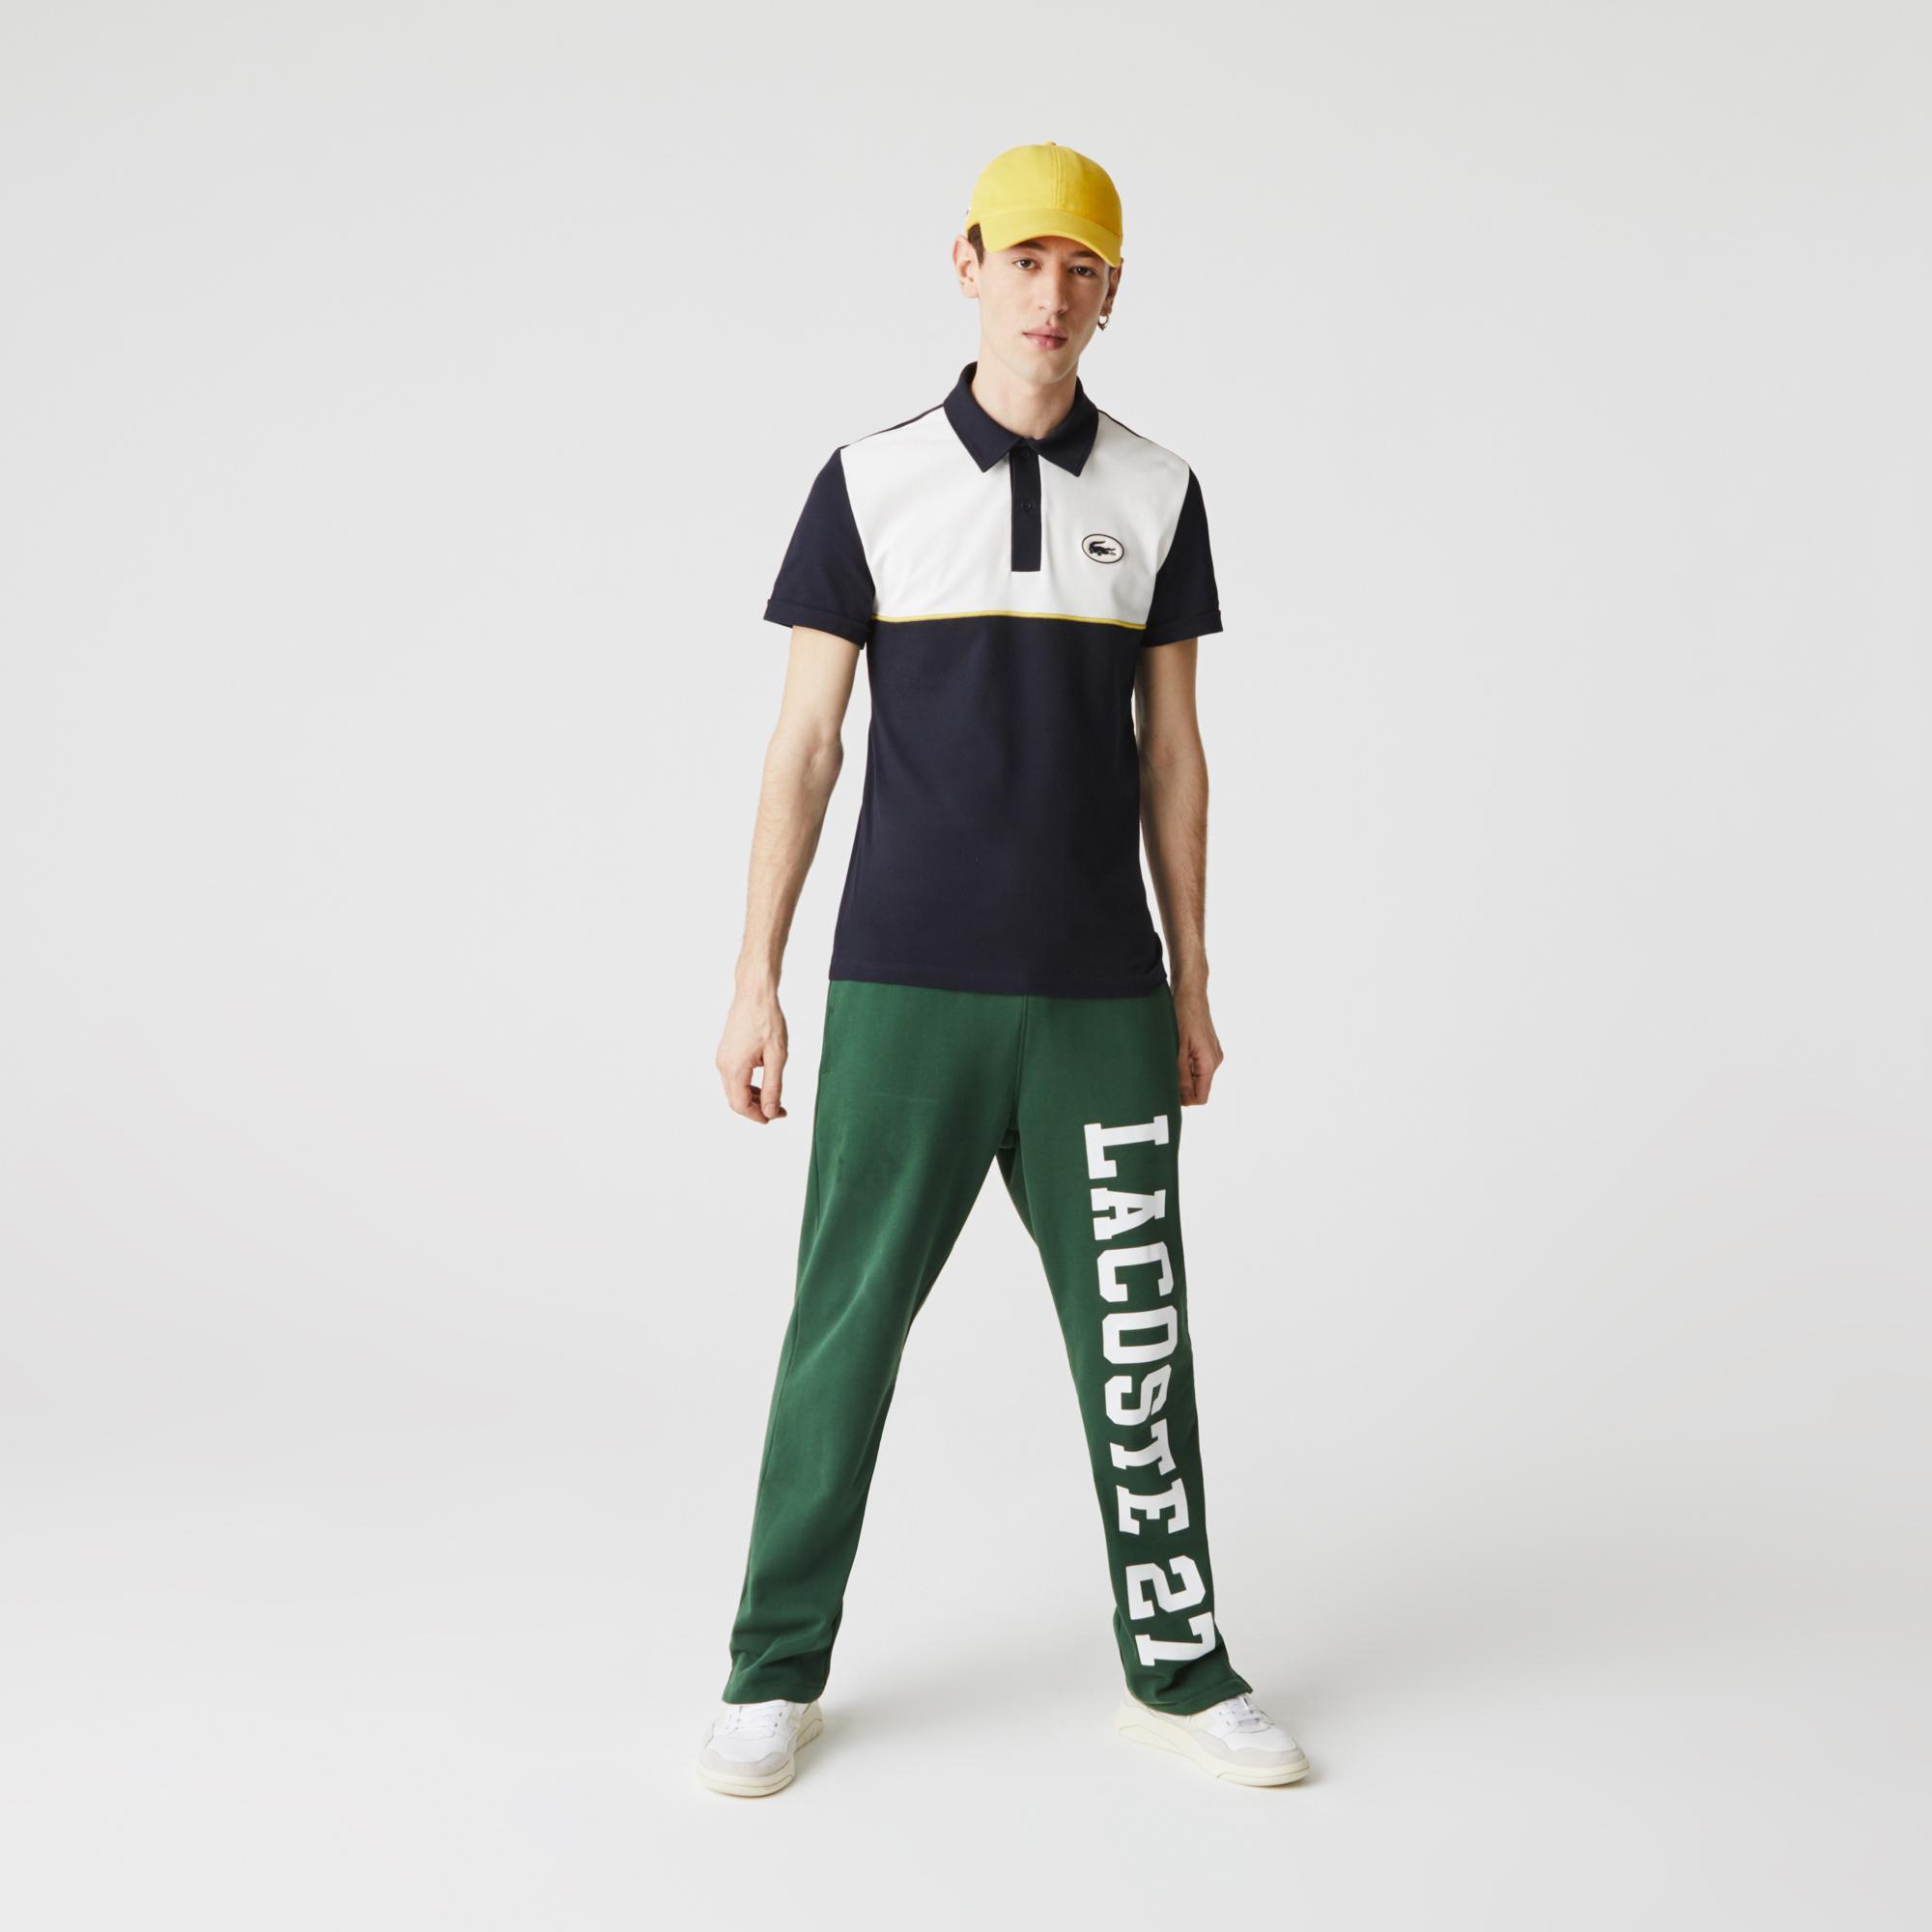 Lacoste Erkek Slim Fit Renk Bloklu Beyaz - Lacivert Polo